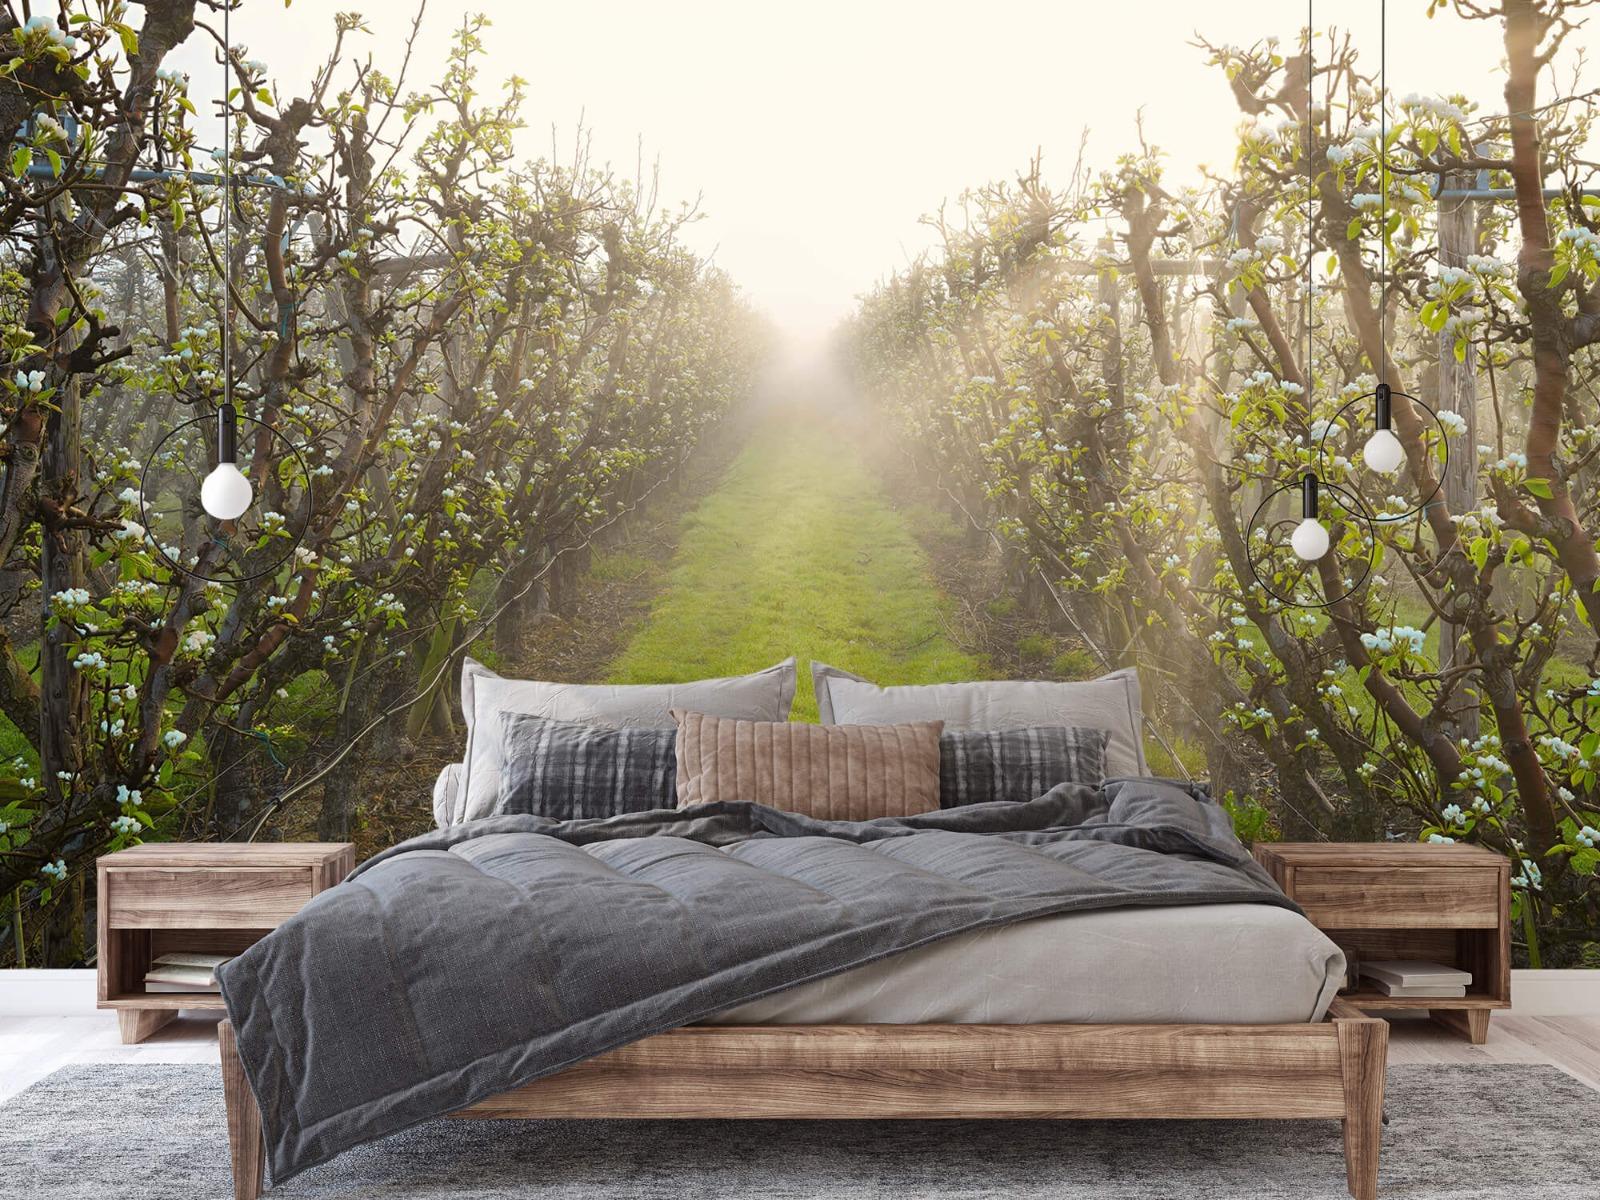 Bomen - Perenbloesem in mist - Slaapkamer 2